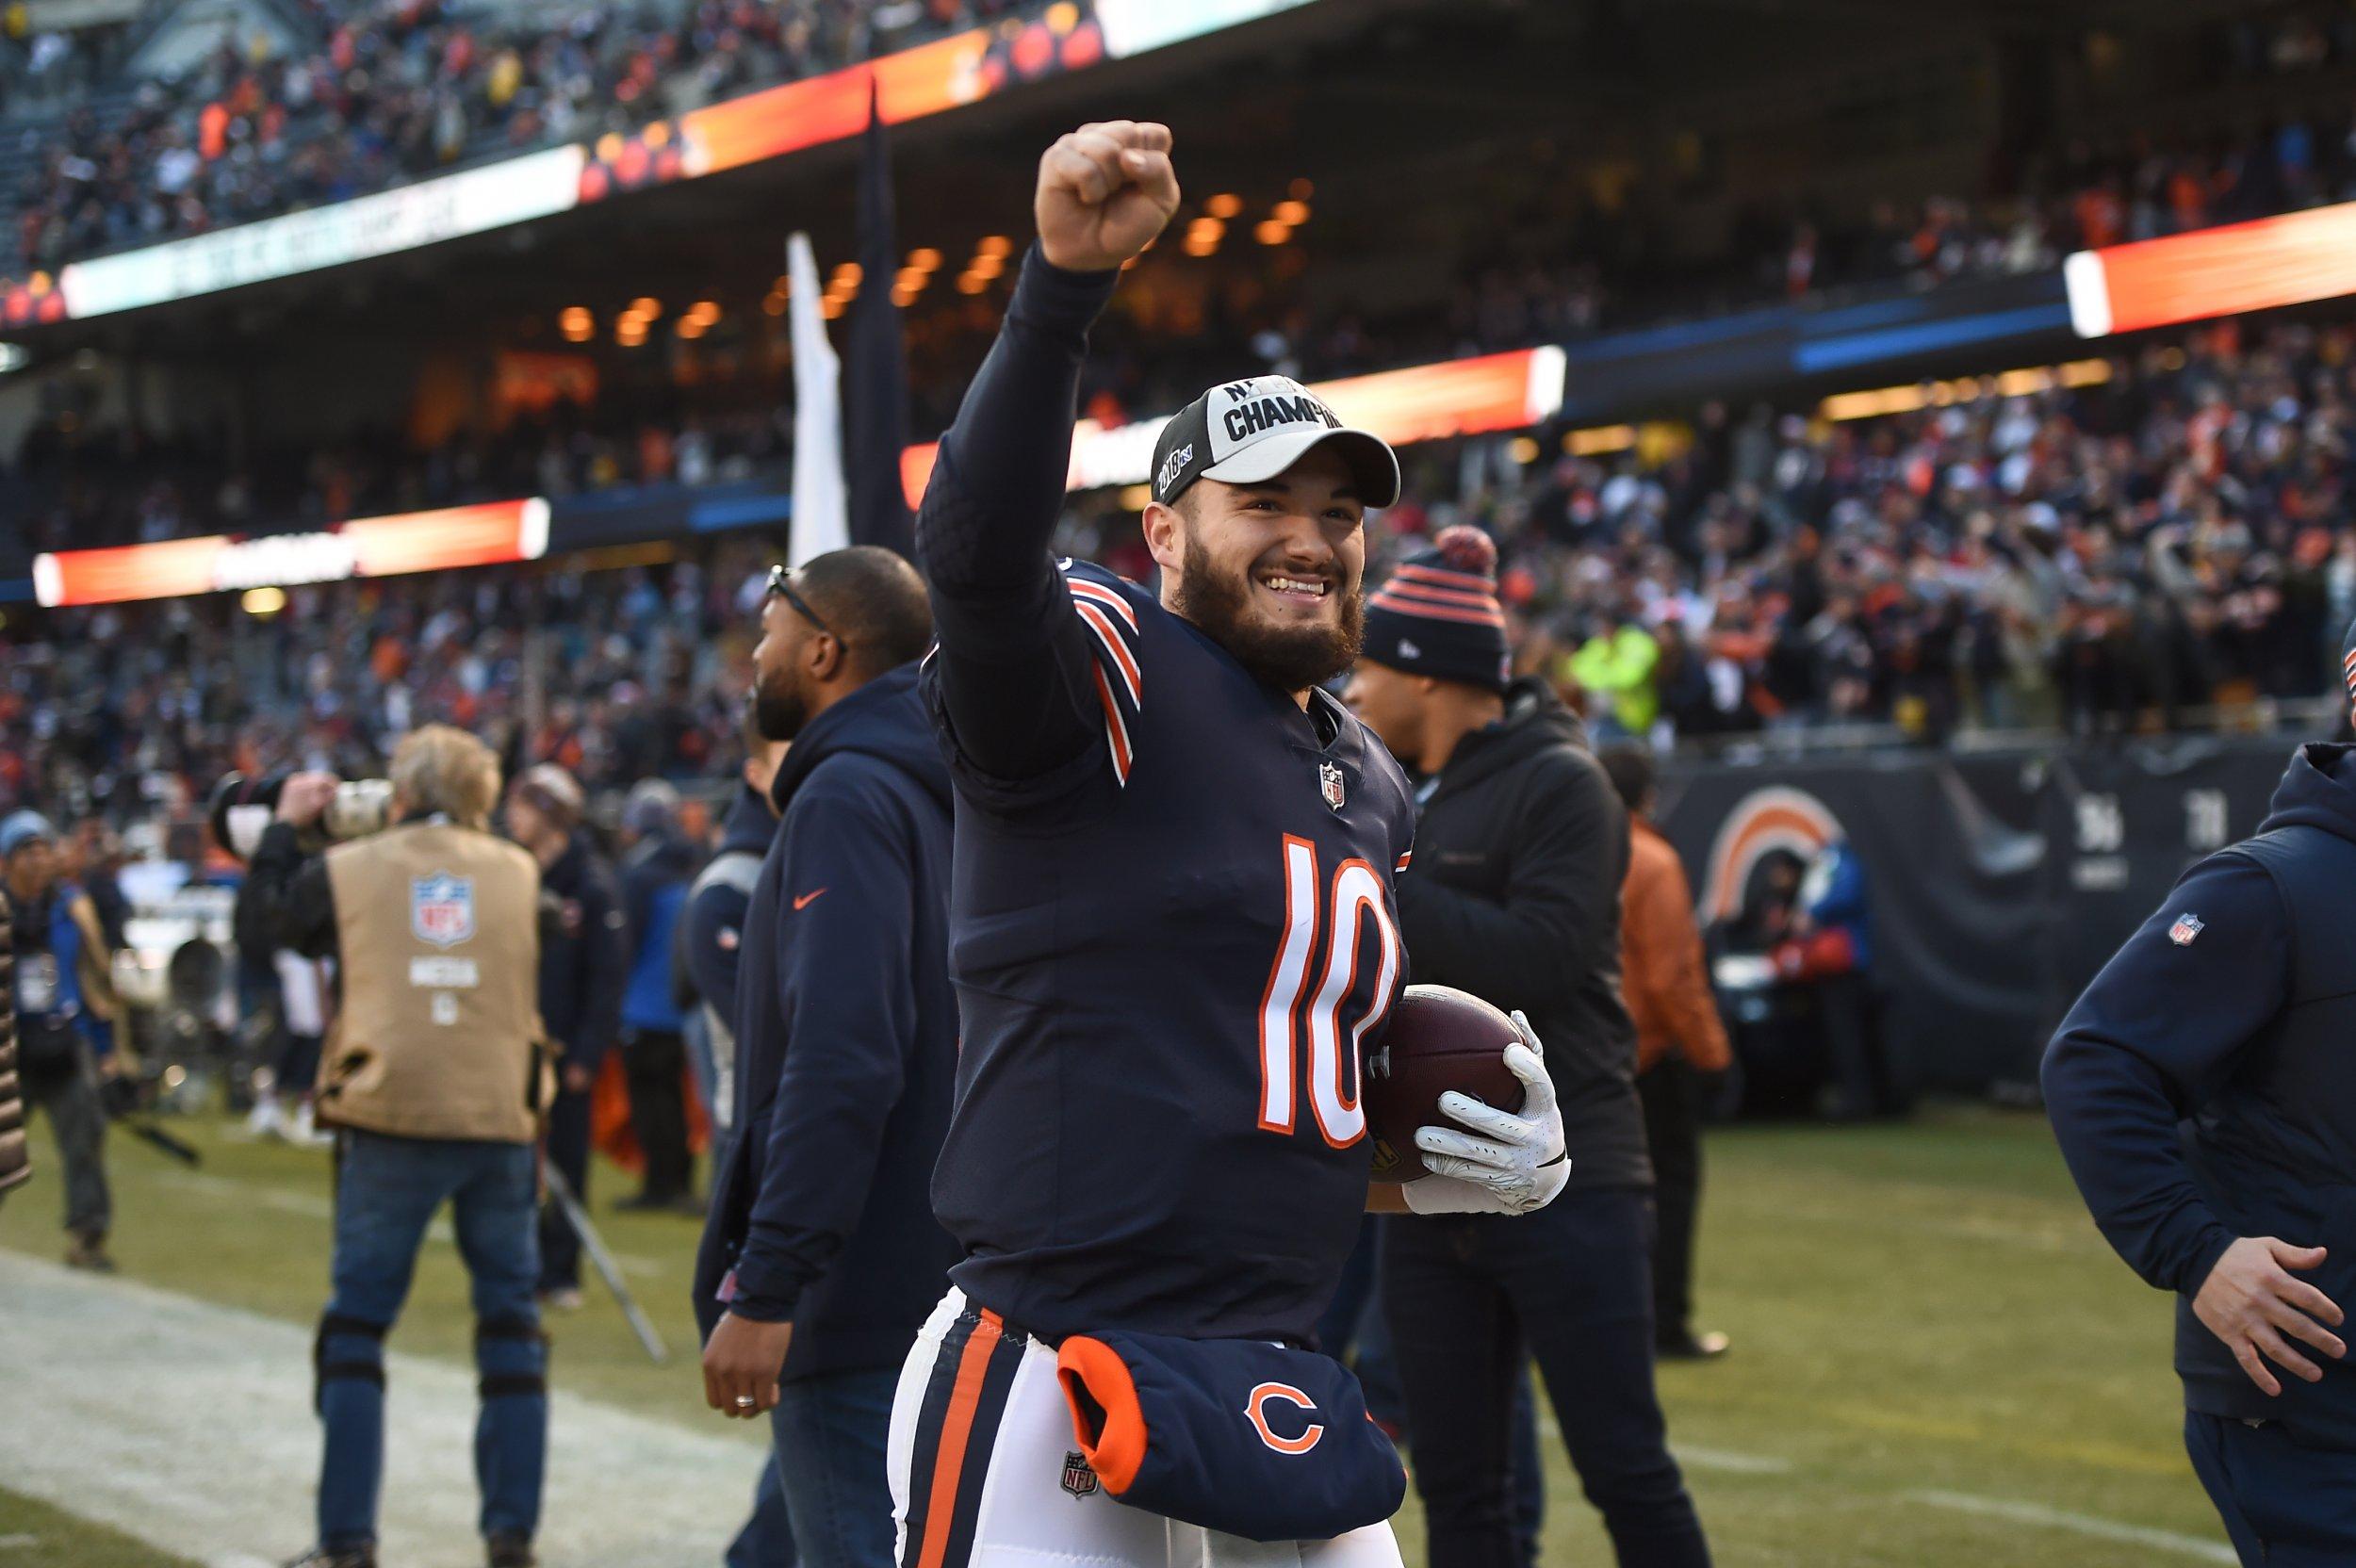 Mitchell Trubisky, Chicago Bears